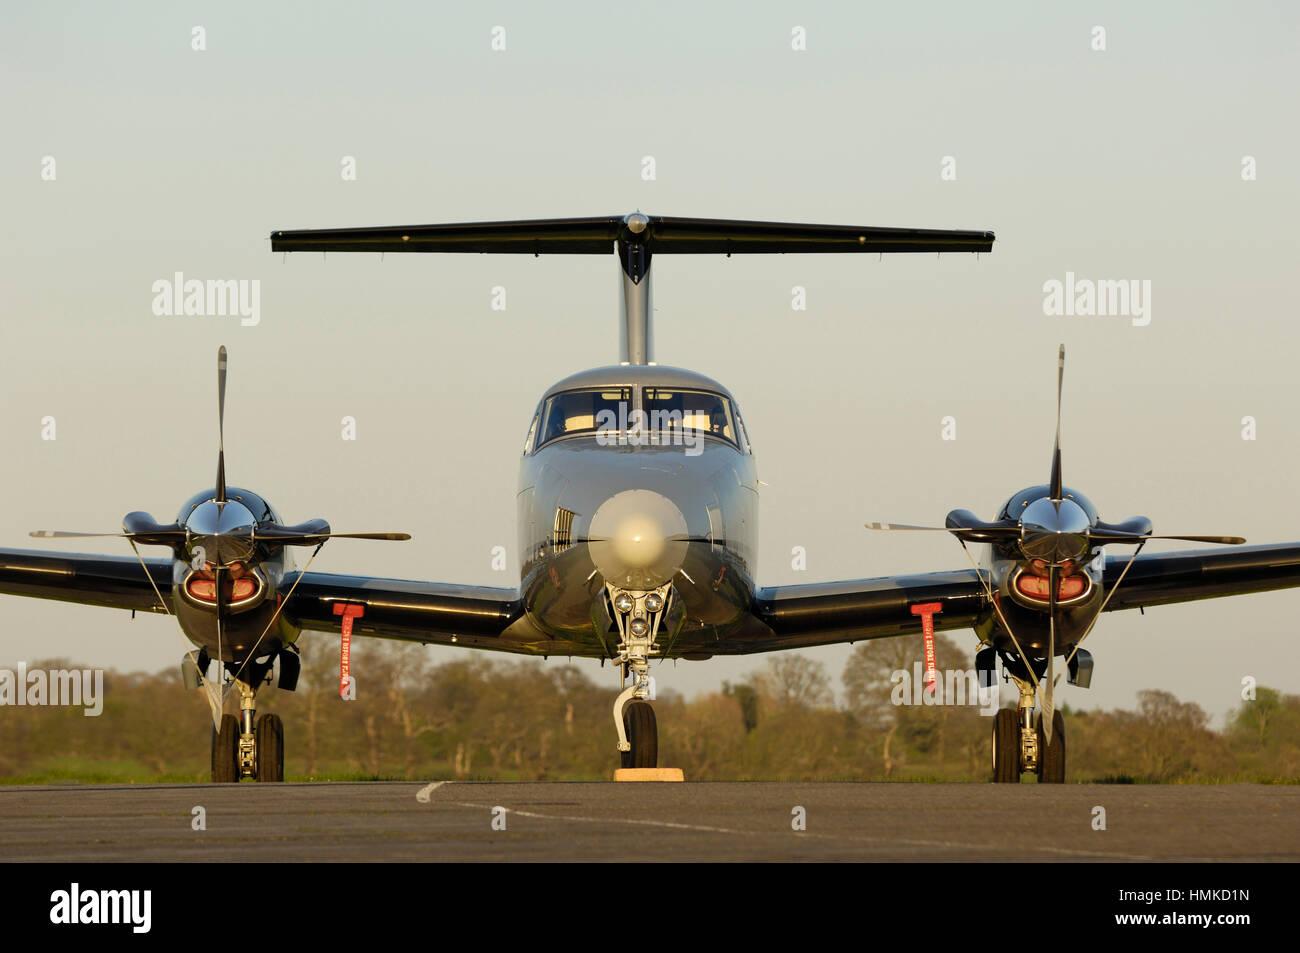 Sinergia Aviation Beechcraft King Air B200 parcheggiata Immagini Stock